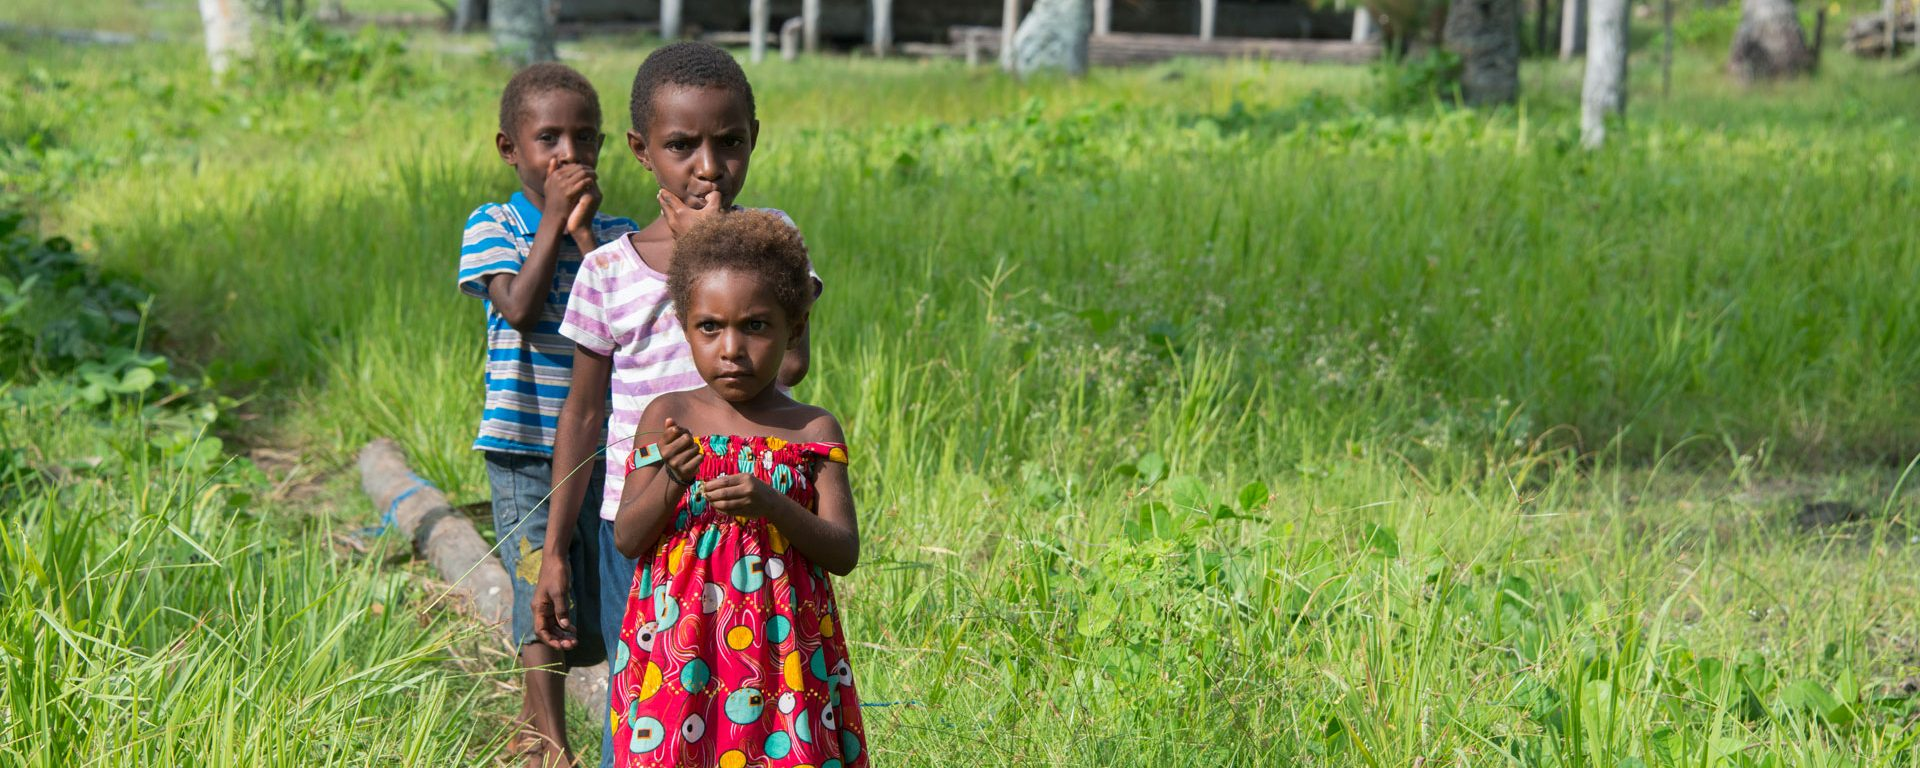 Village children in Papua New Guinea's Sepik River area